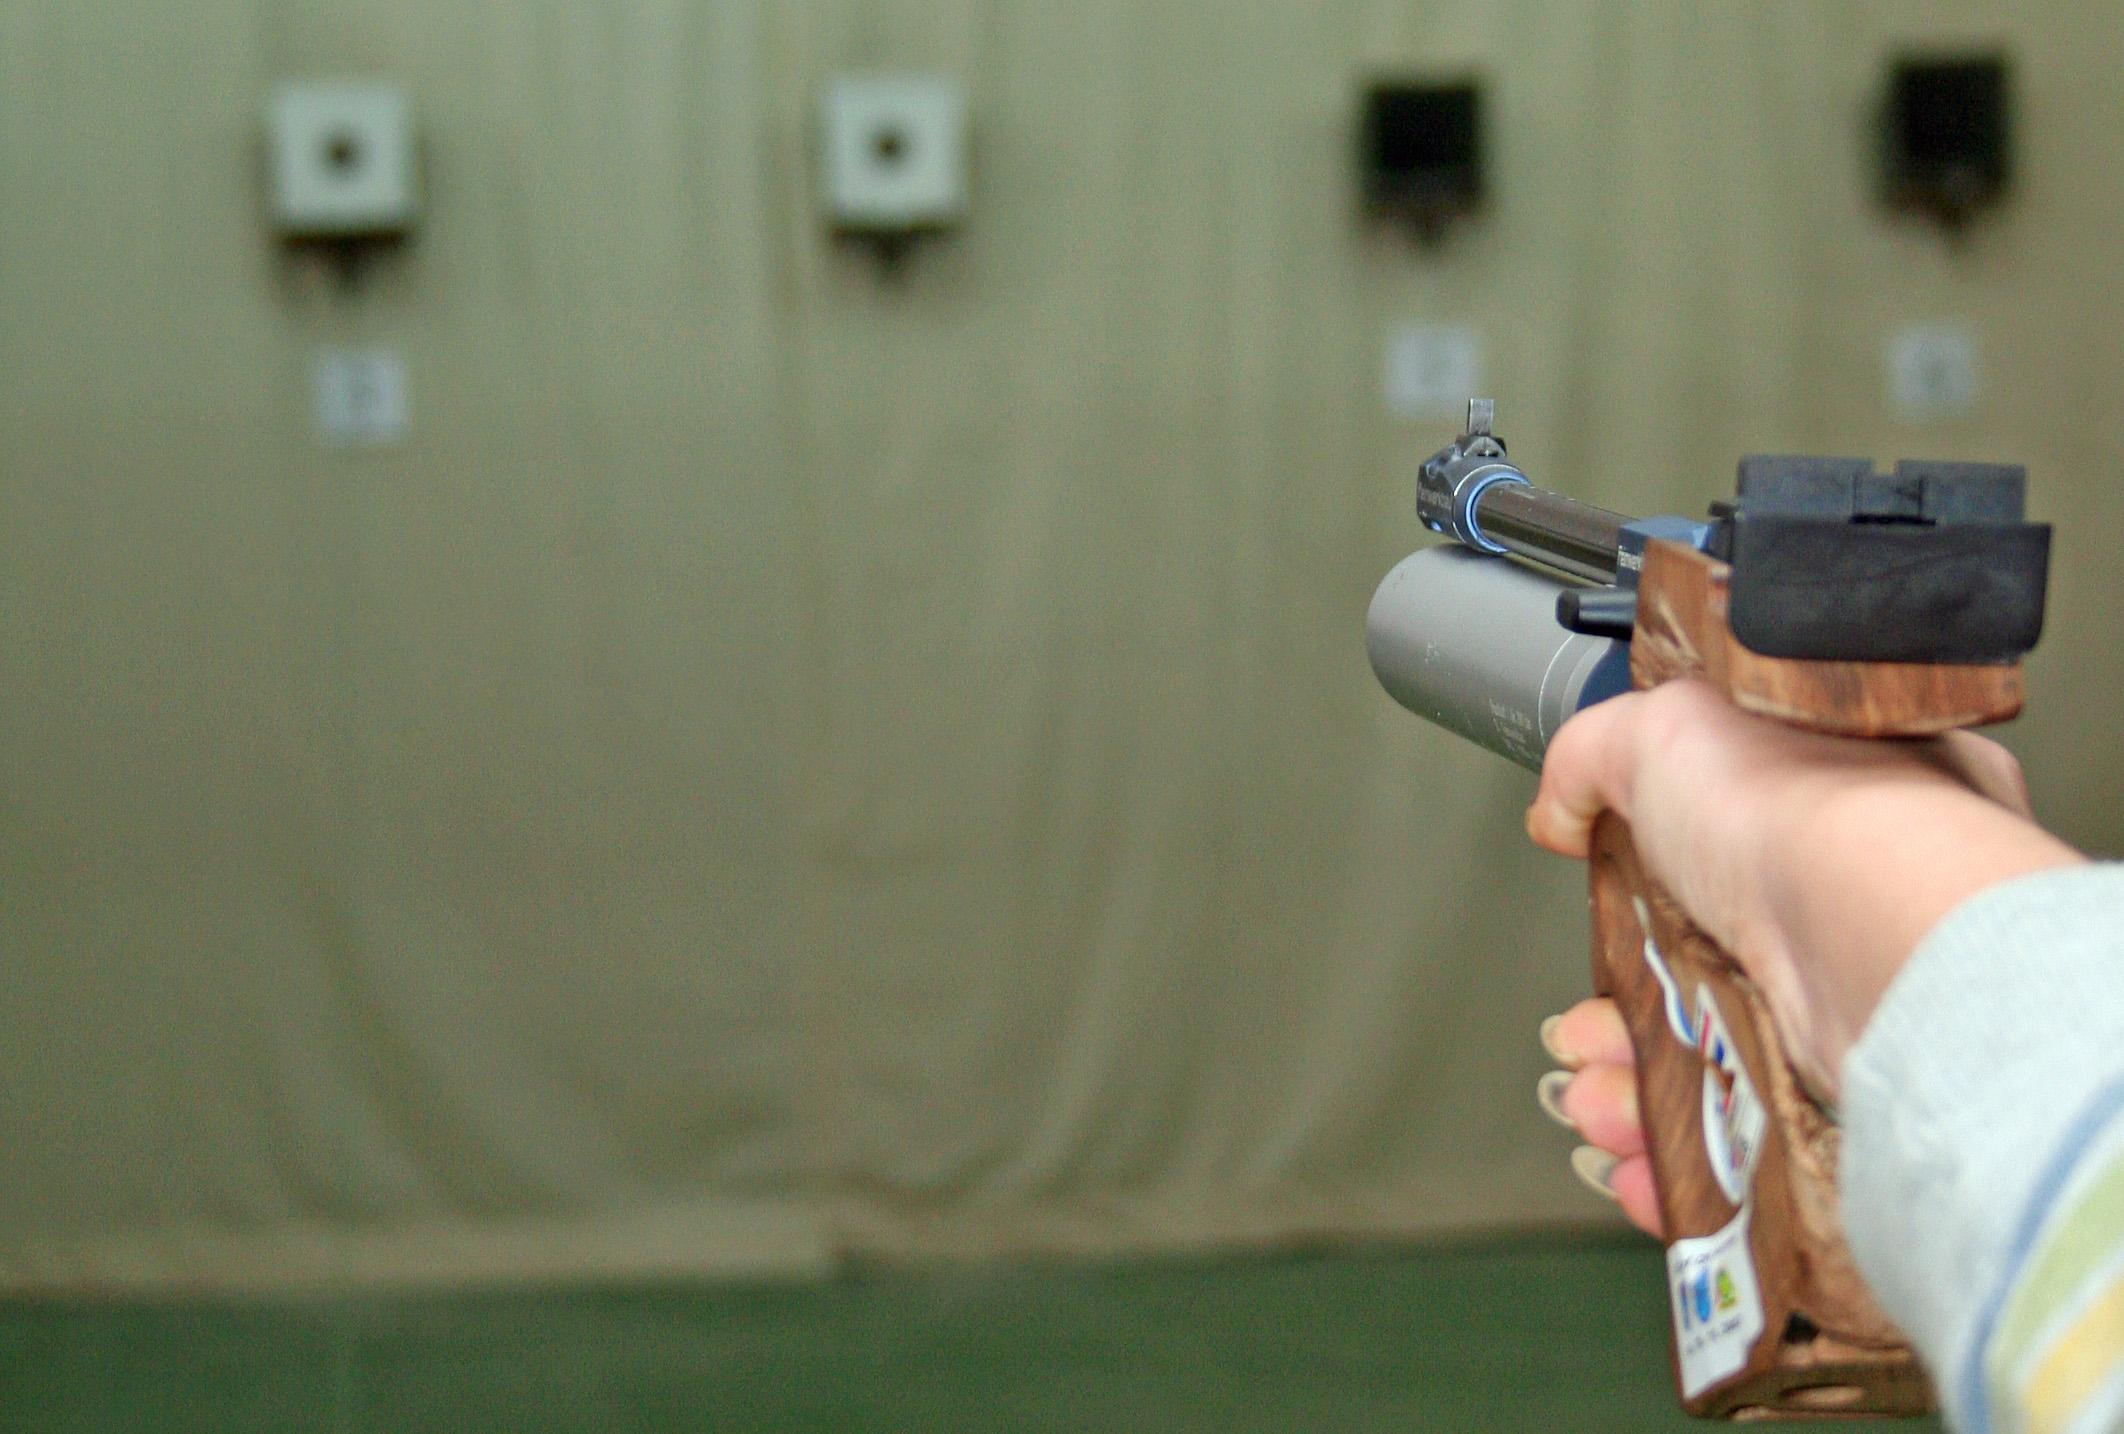 Мирослава Минчева спечели сребърния медал в дисциплината 10 метра пистолет